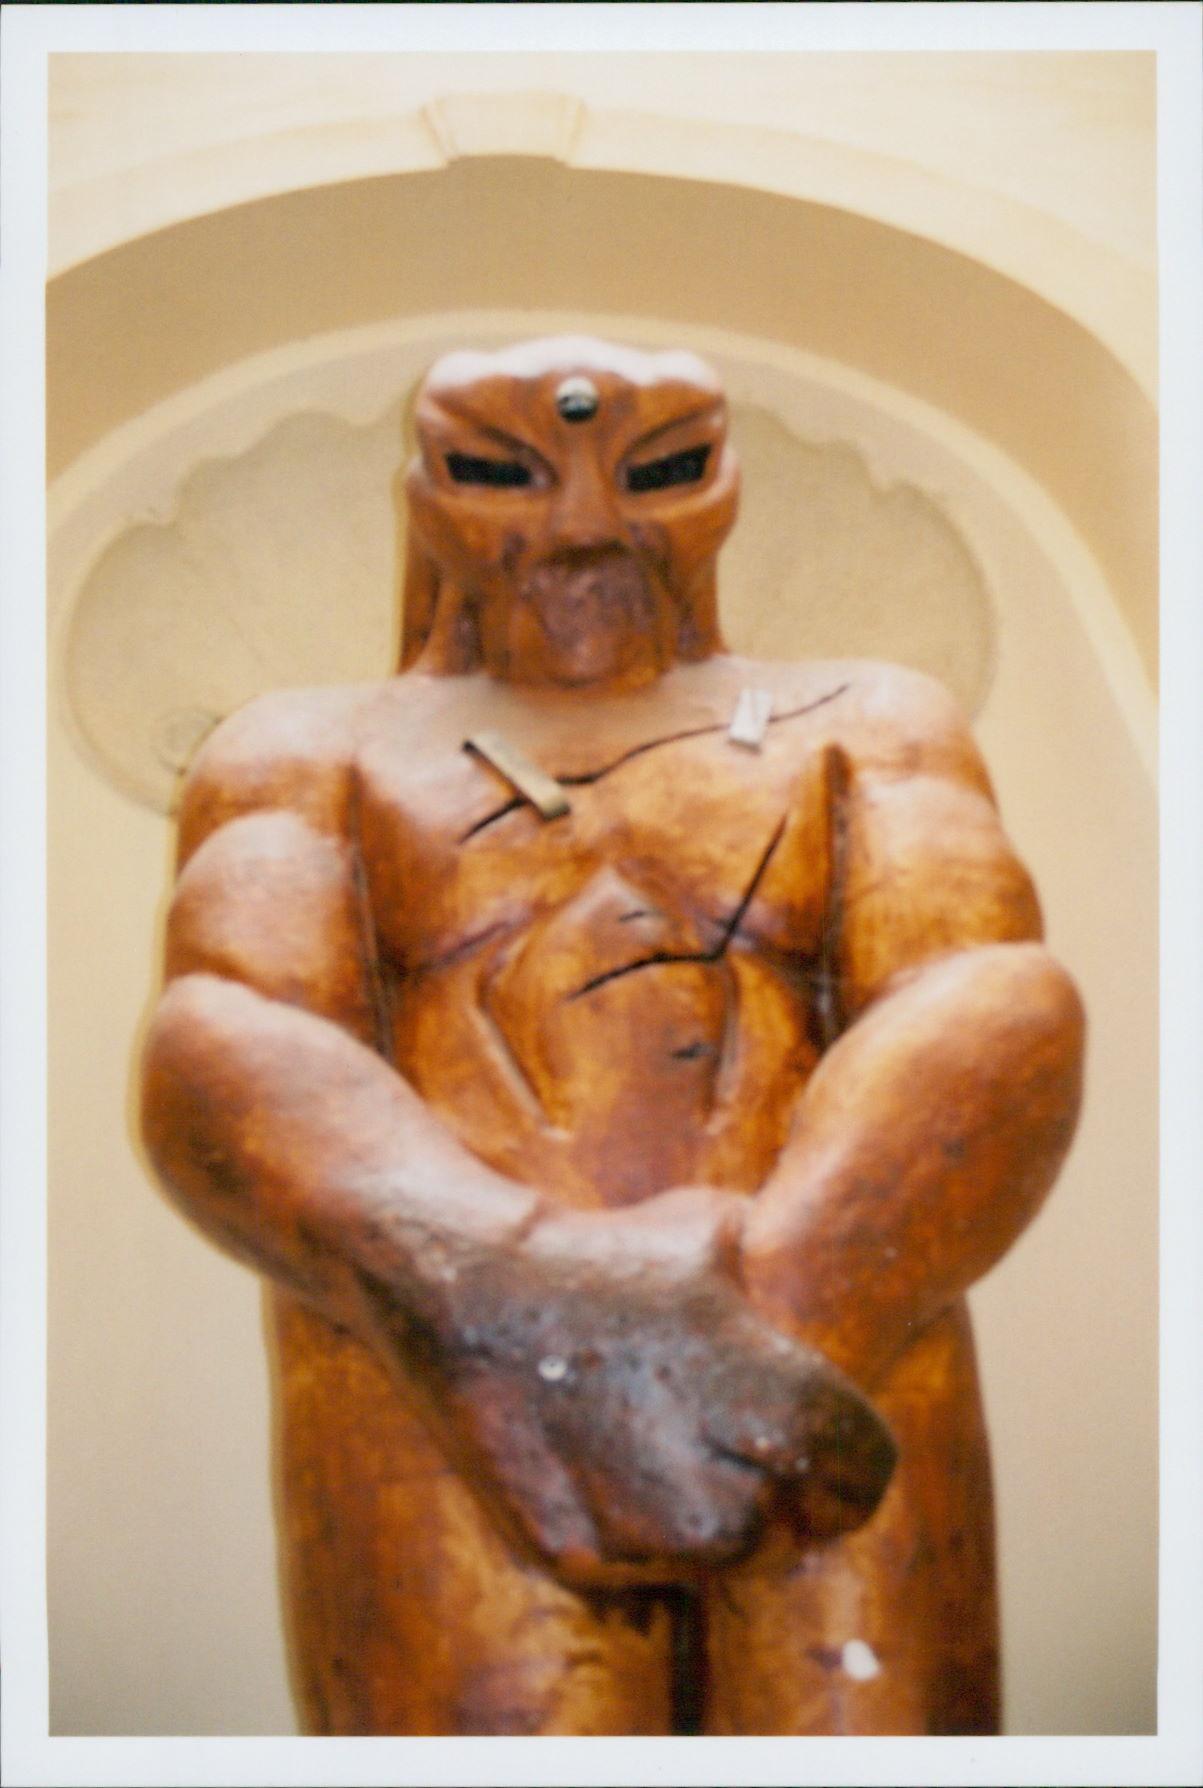 Golem statue in Prague. Photo credit: Jason